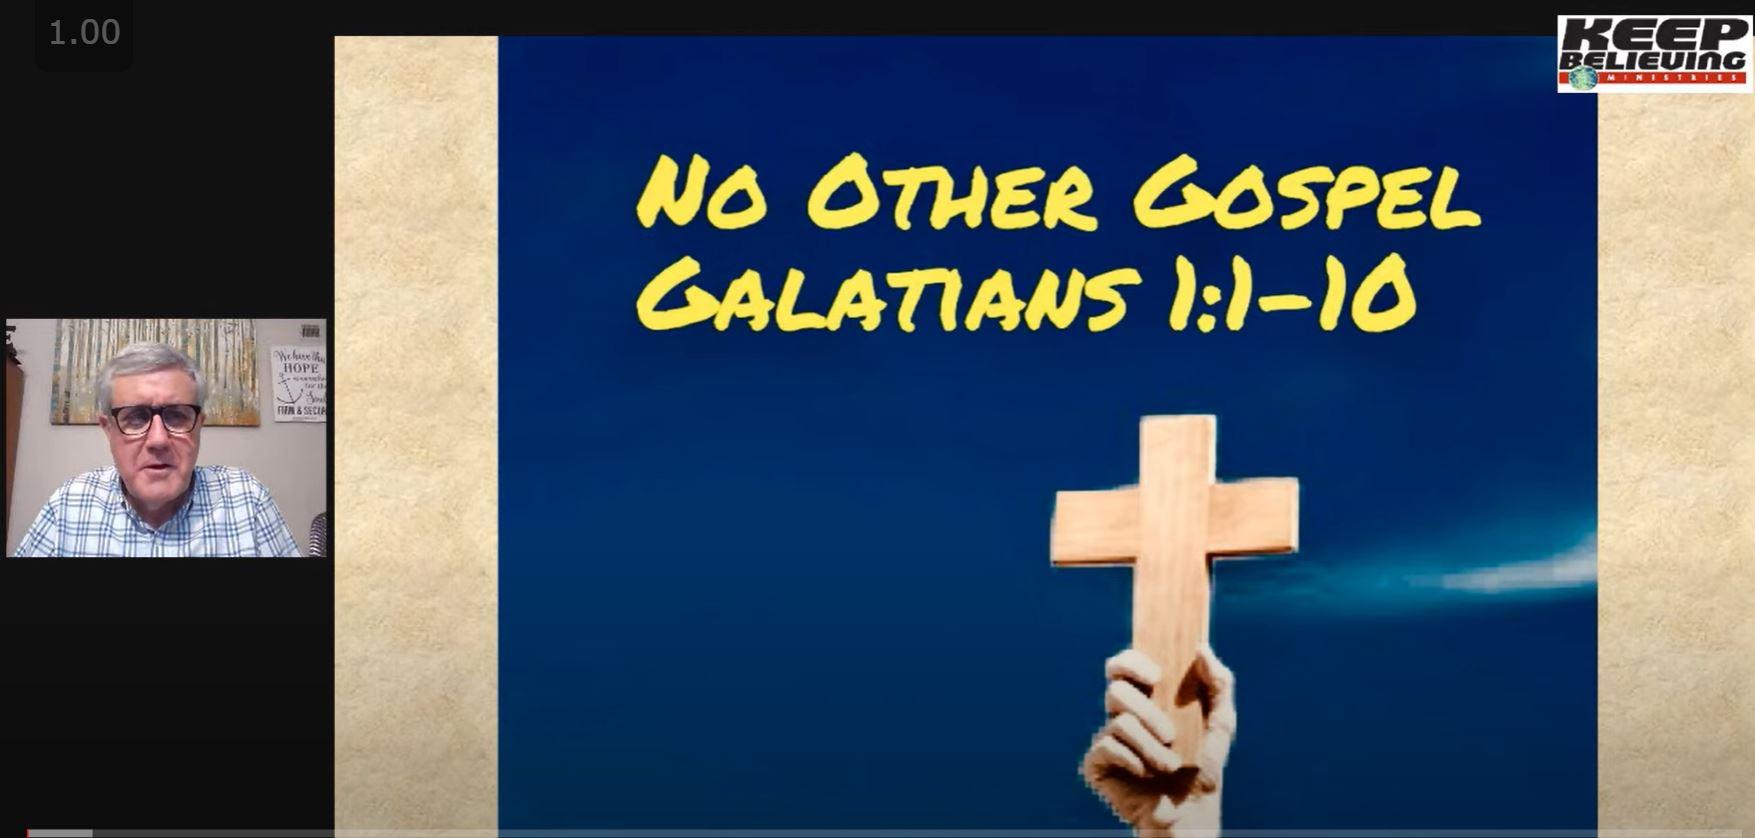 No Other Gospel (Galatians 1:1-10)